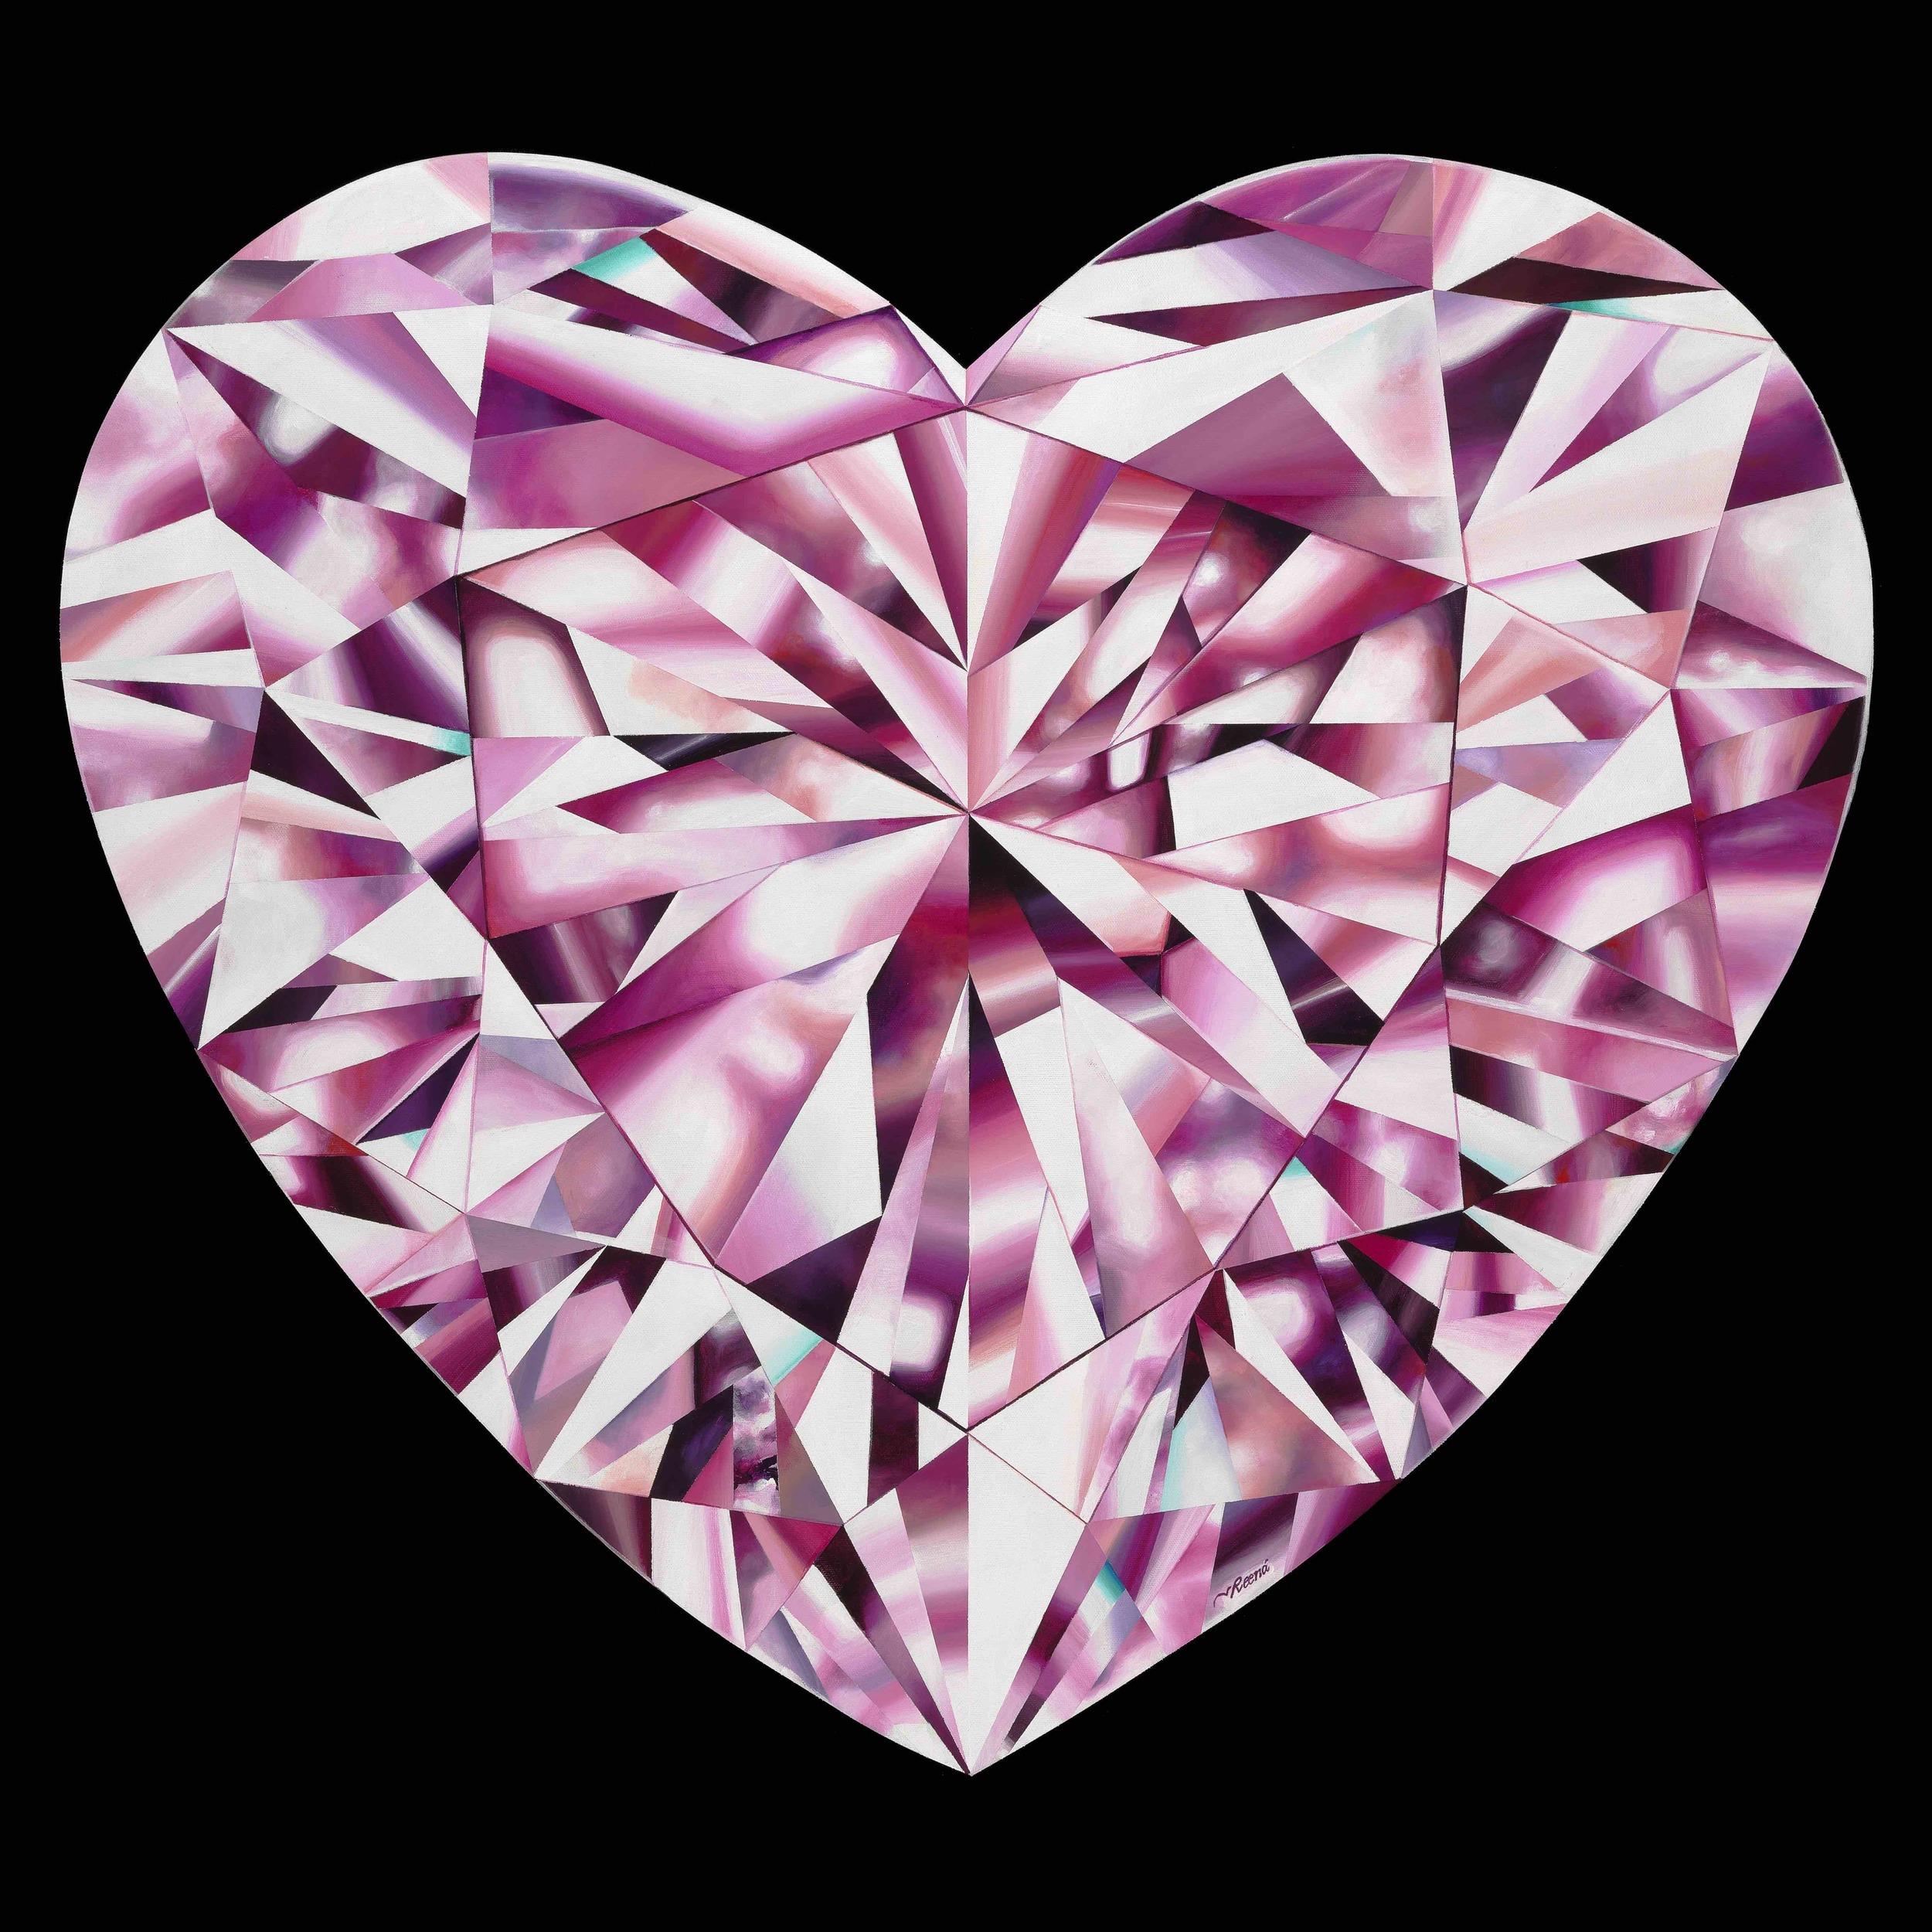 'Passionate Heart' - Portrait of a Pink Heart-Shaped Diamond 36 x 36 inches. Acrylic on Canvas. ©Reena Ahluwalia